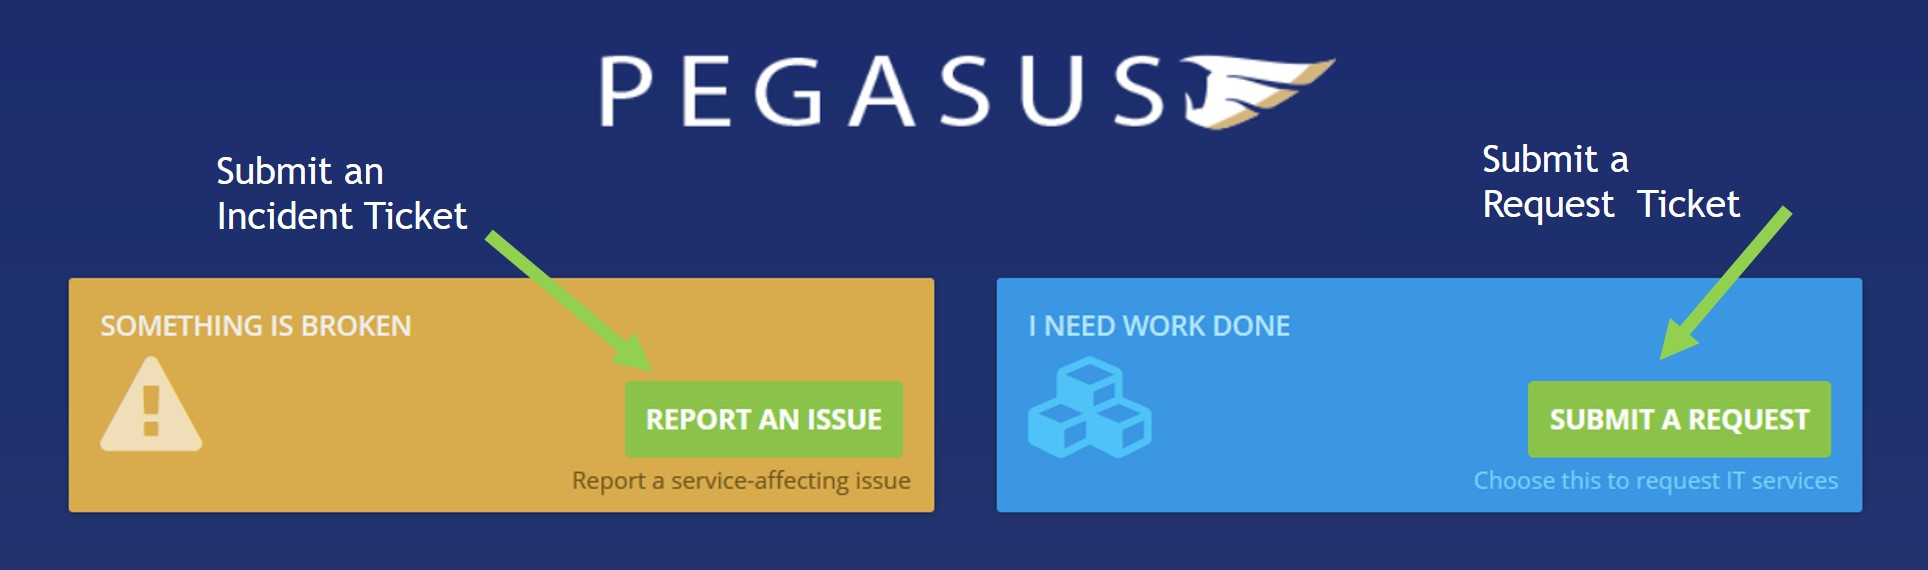 Pegasus Ticket Portal.jpg